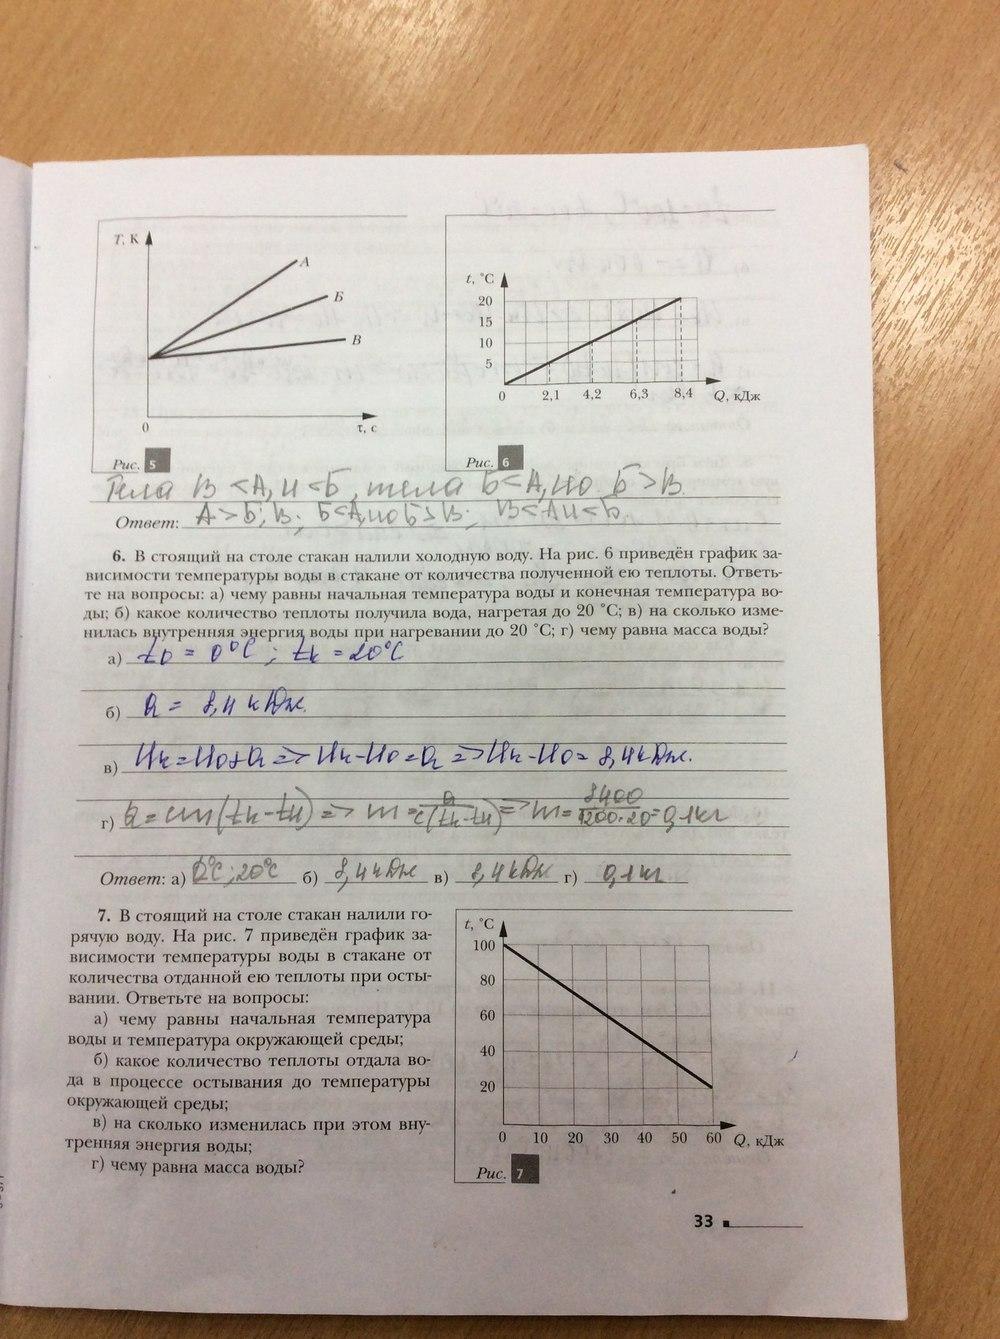 физика 10 класс грачев погожев гдз